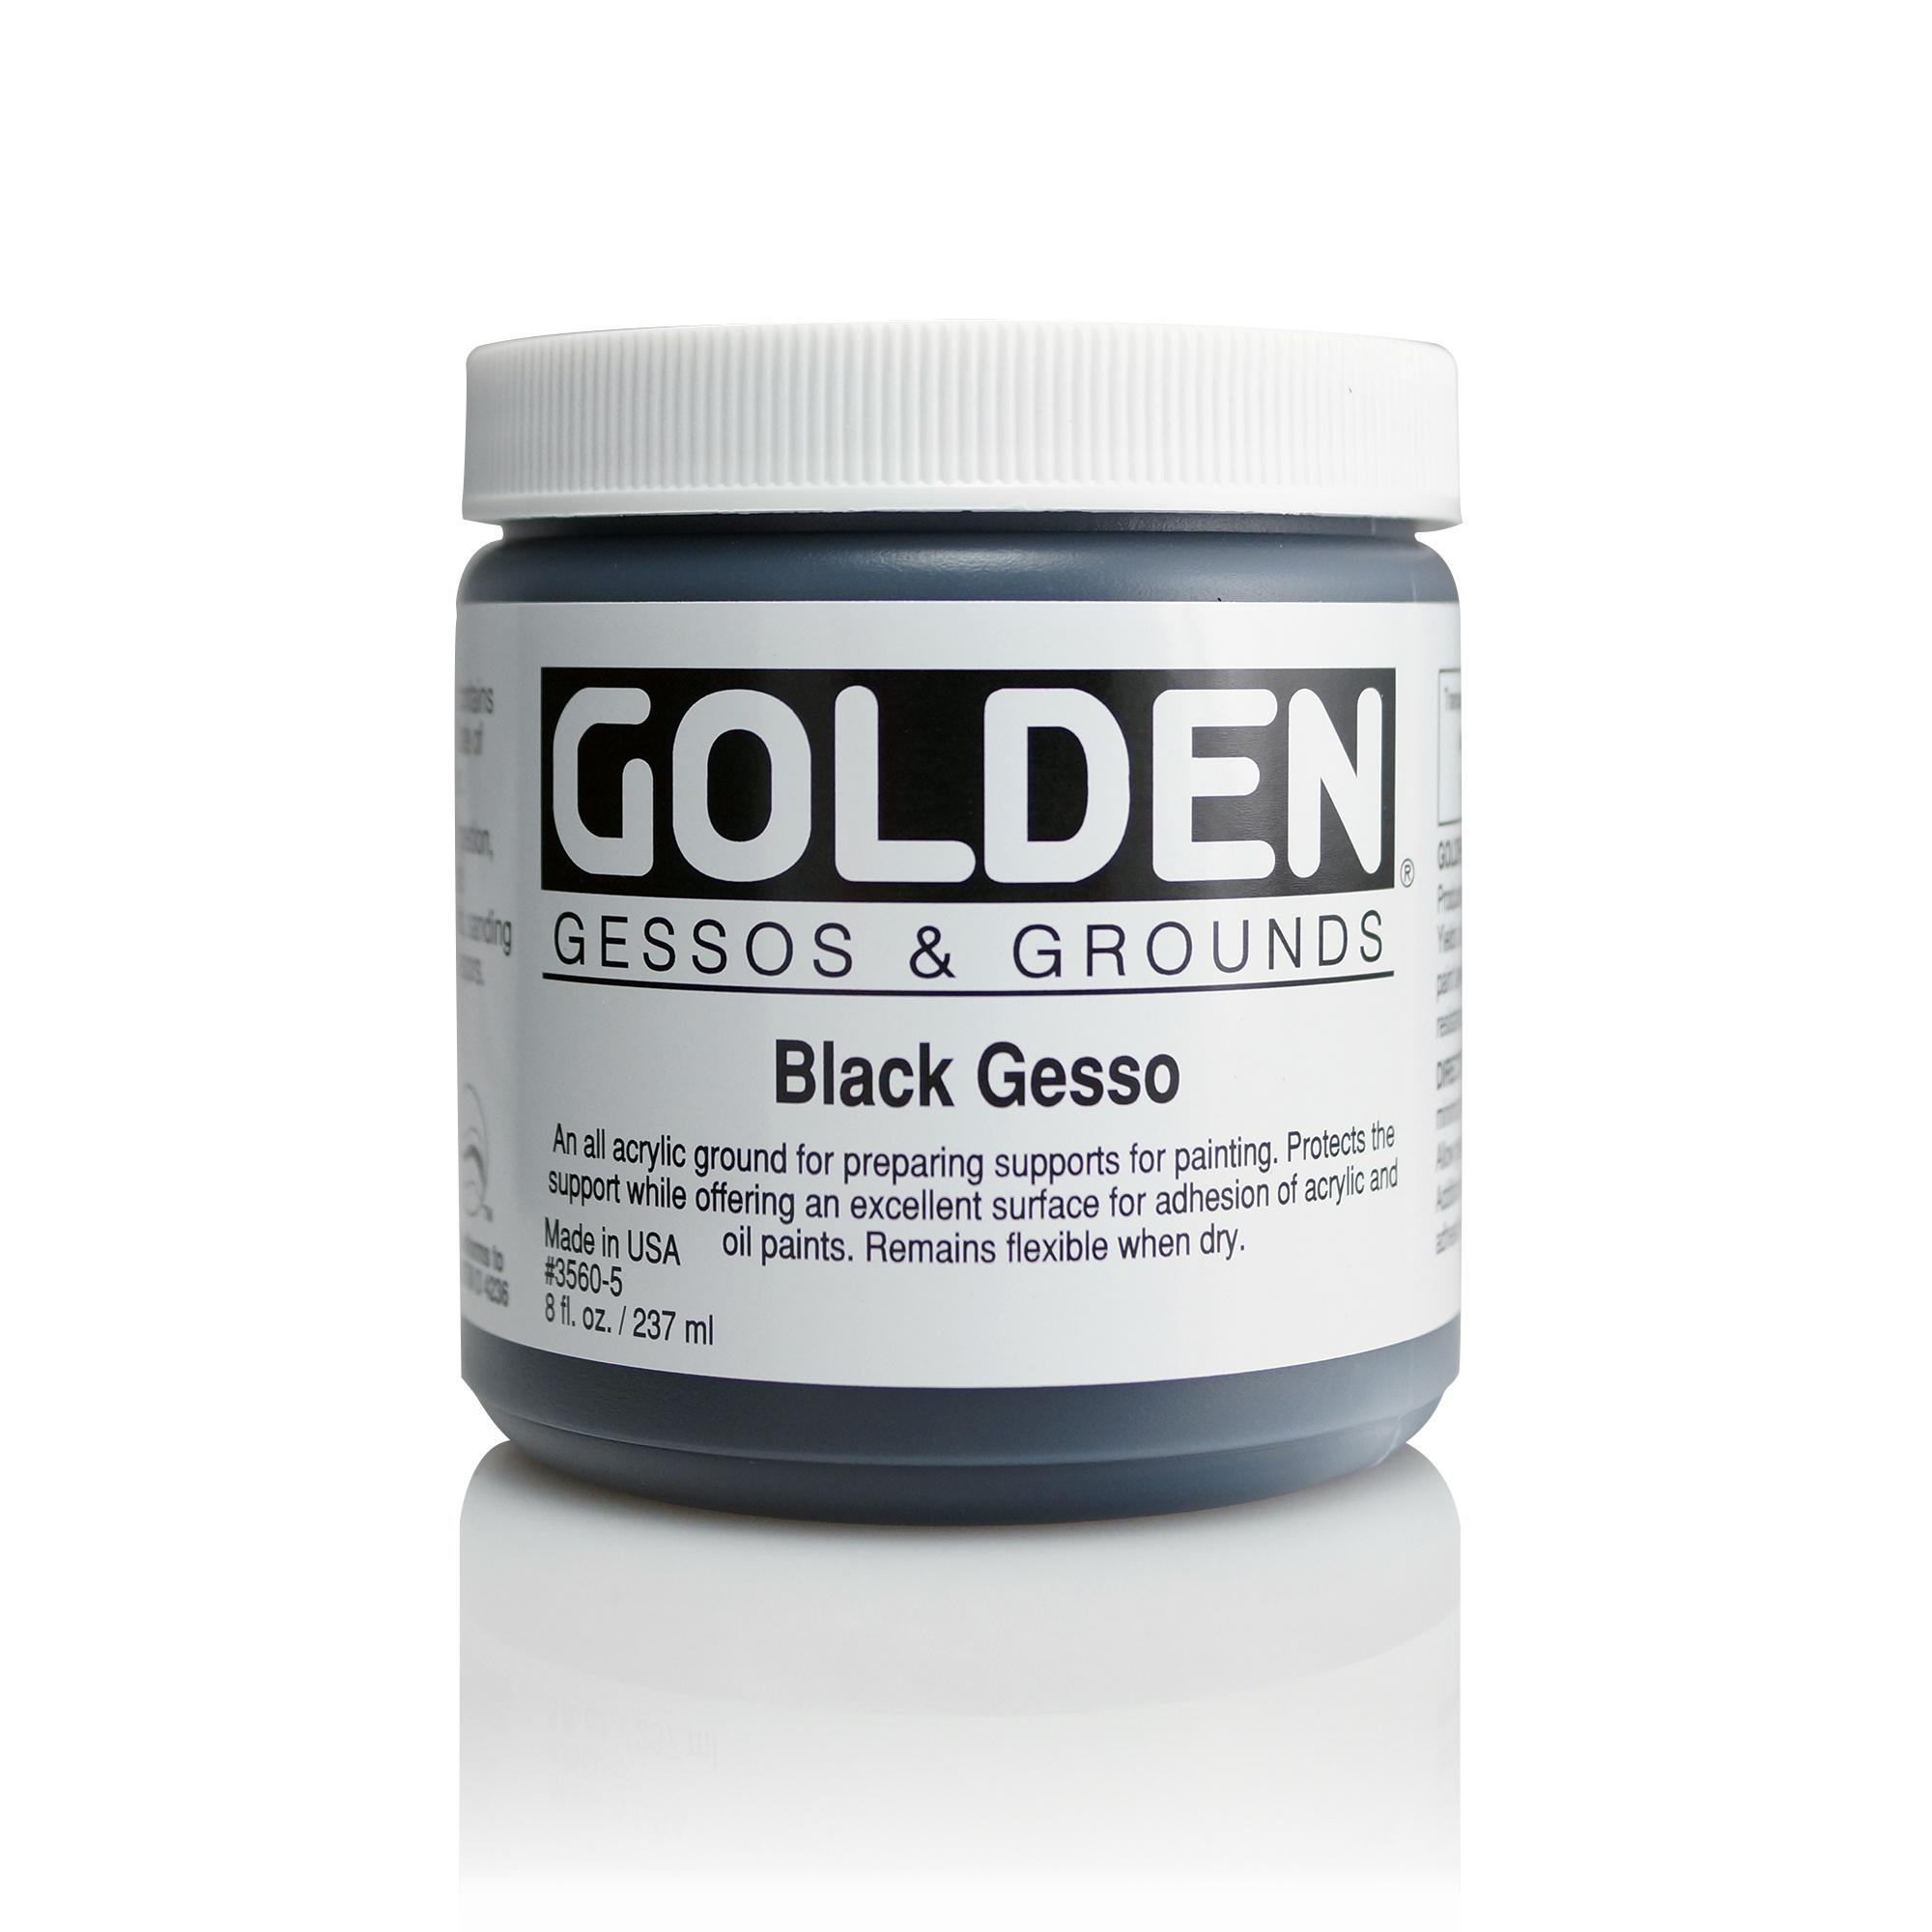 GOLDEN GOLDEN ACRYLIC MEDIUM GESSO